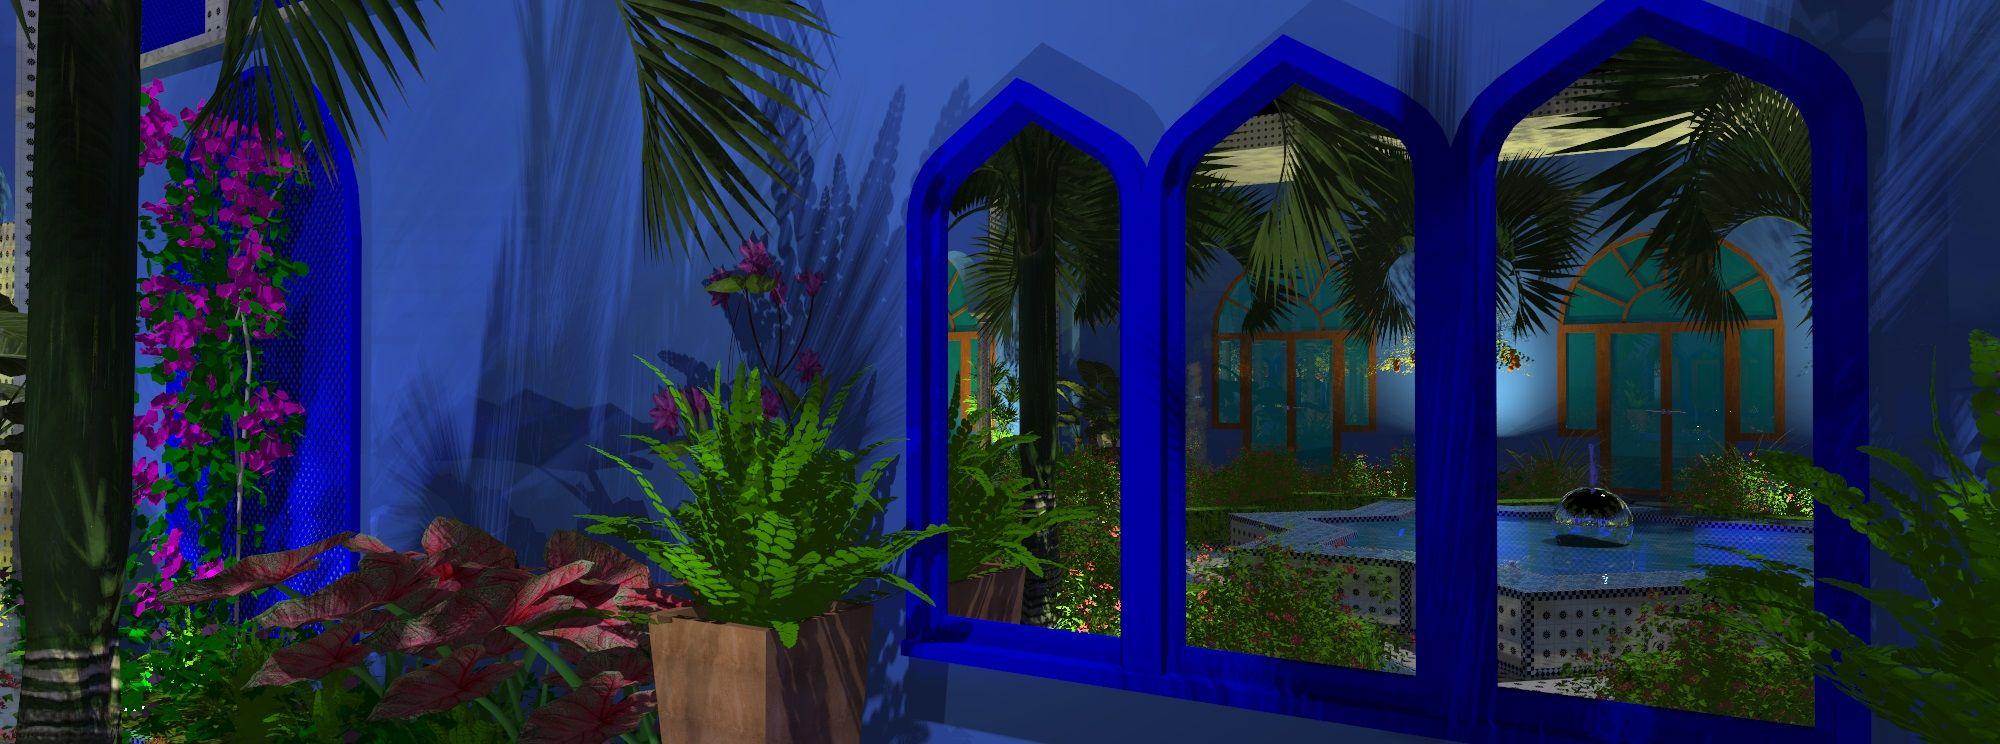 Landscape Video Moroccan Garden Design / Colonnaded ...